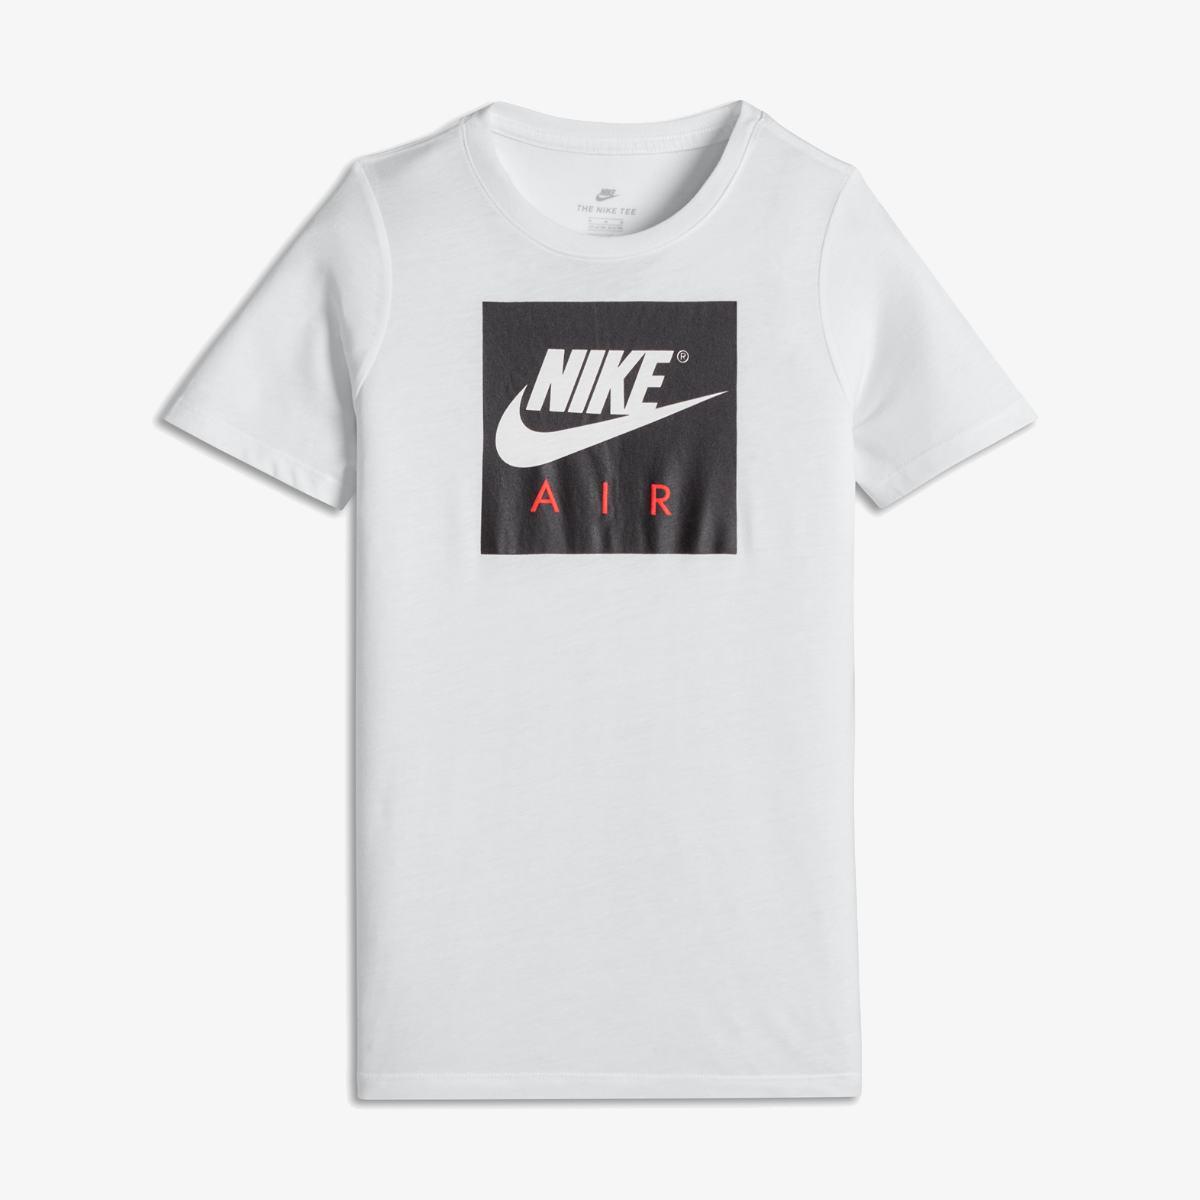 e586752d Купить Детская футболка NIKE NSW Tee Air Logo (Артикул: 894300-100 ...